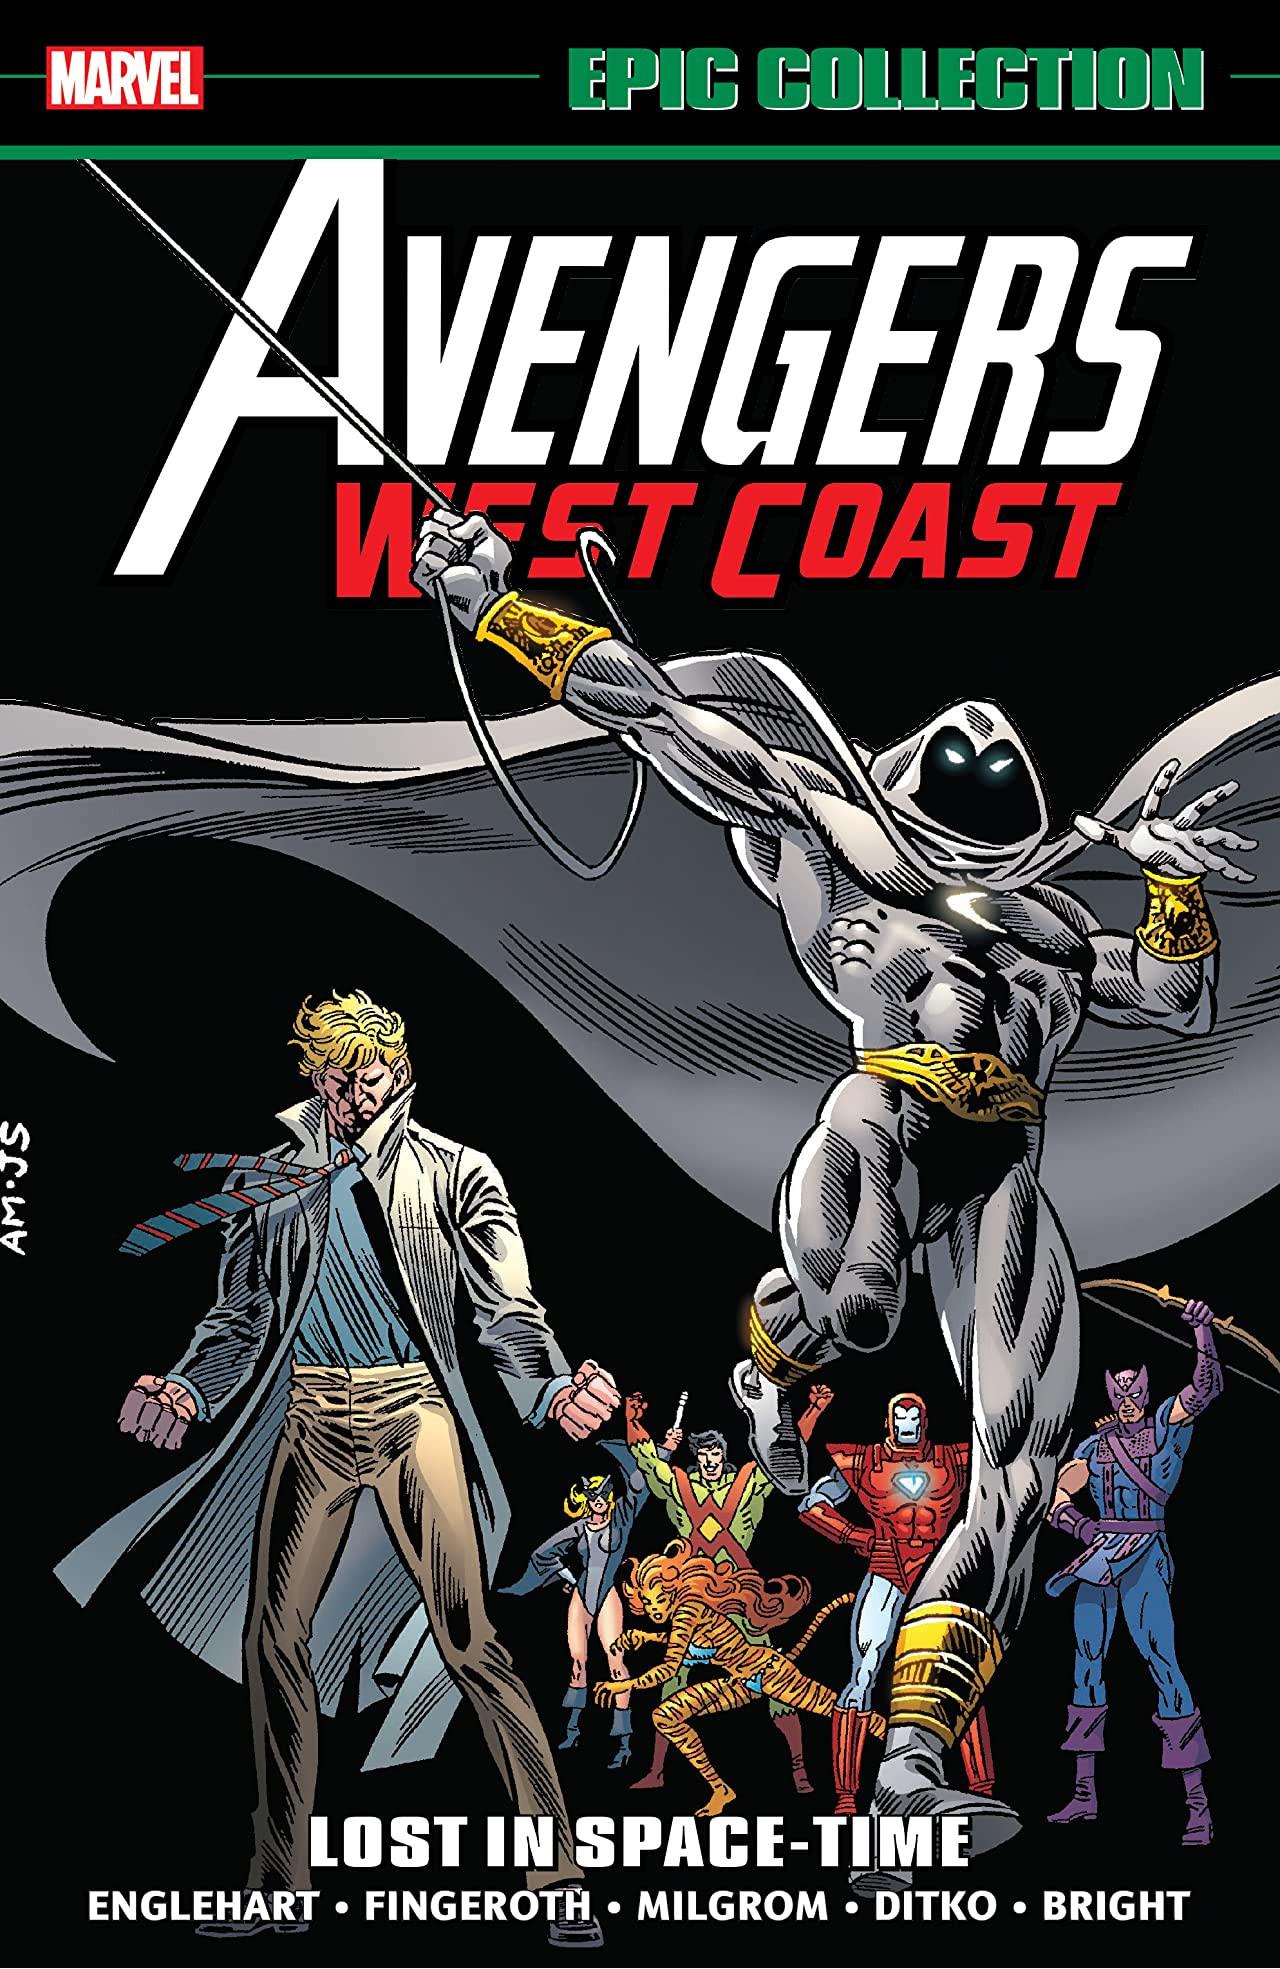 Epic Collection: Avengers West Coast Vol 1 2